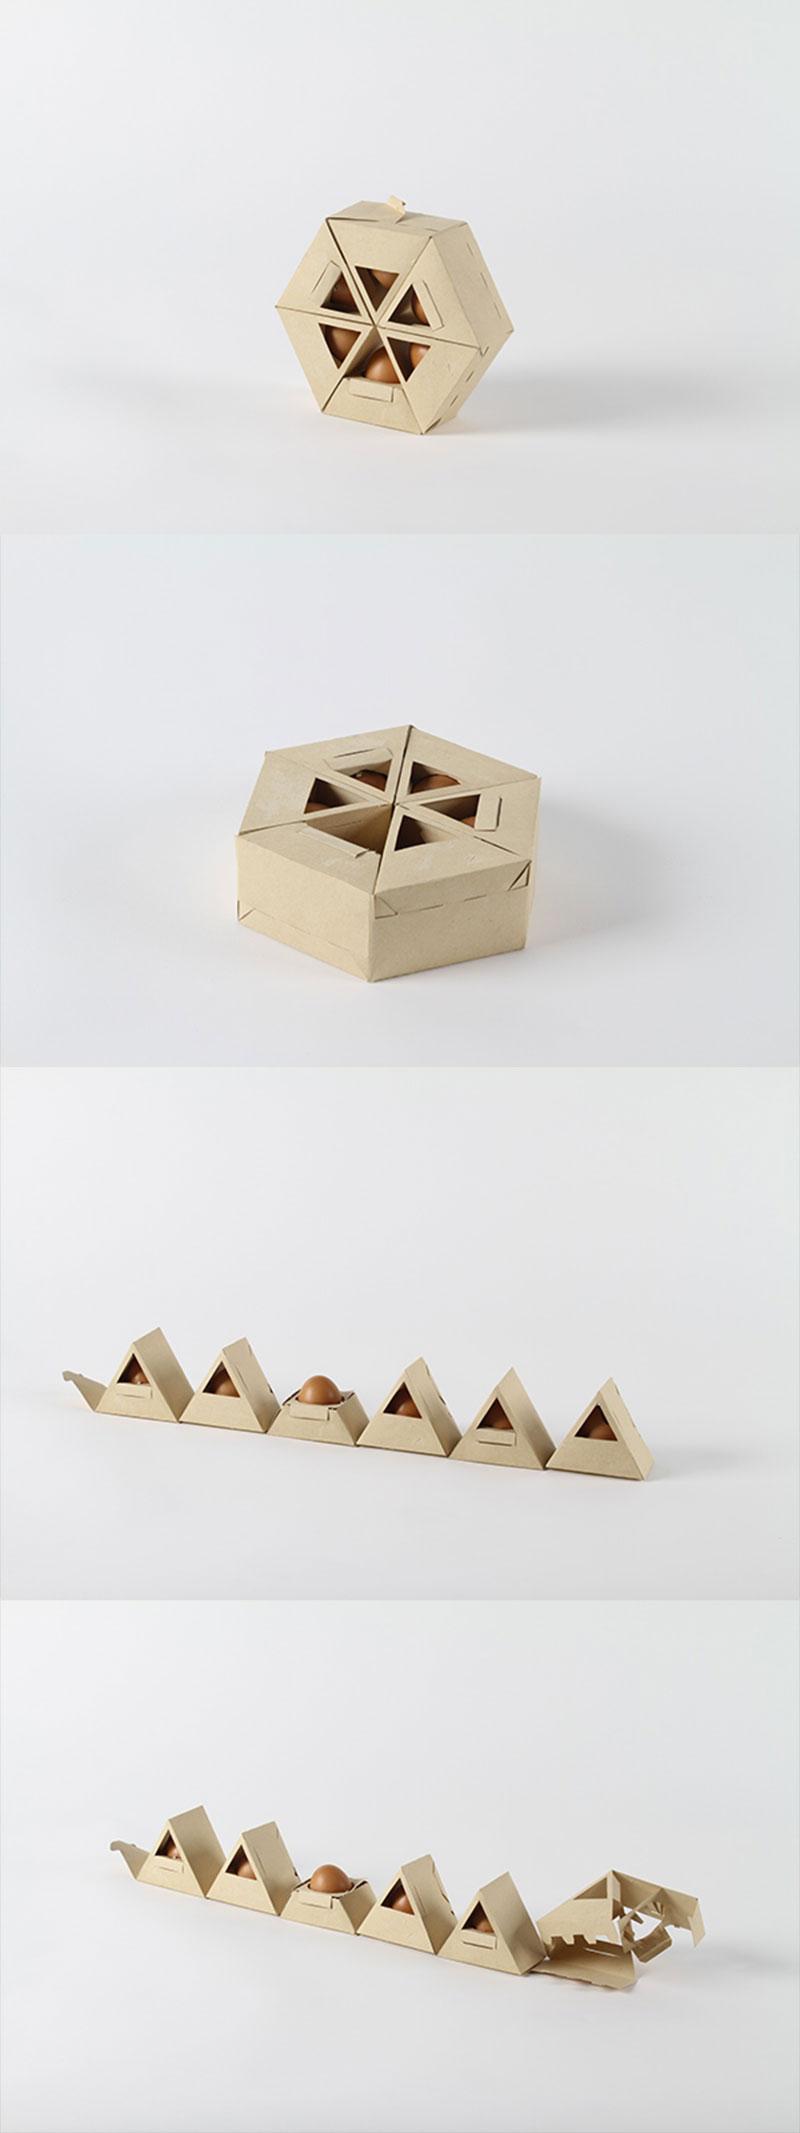 Hexagonial Egg Packaging by Gil Rodrigues